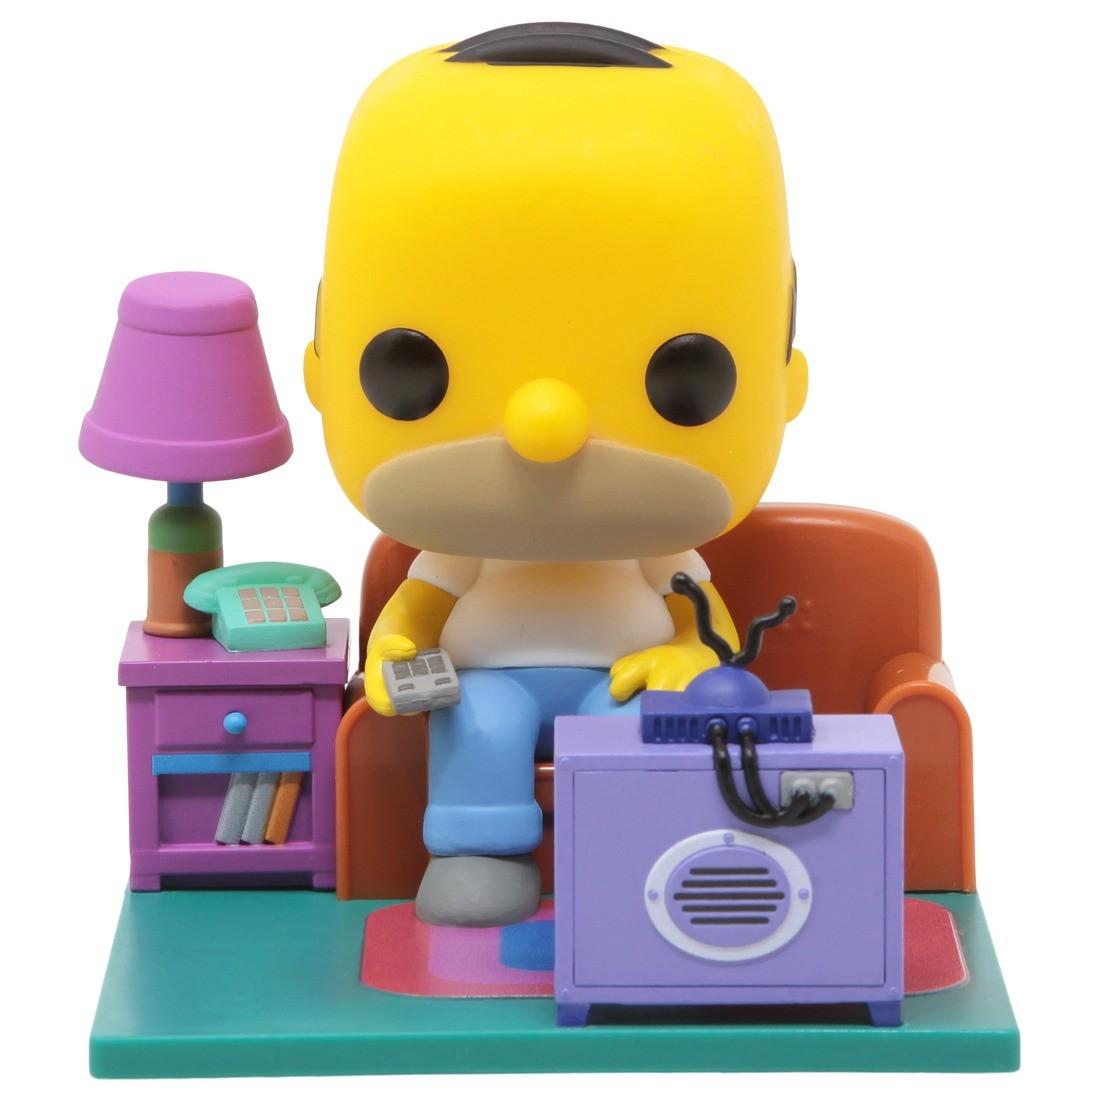 Funko POP Deluxe The Simpsons - Homer Watching TV (yellow)